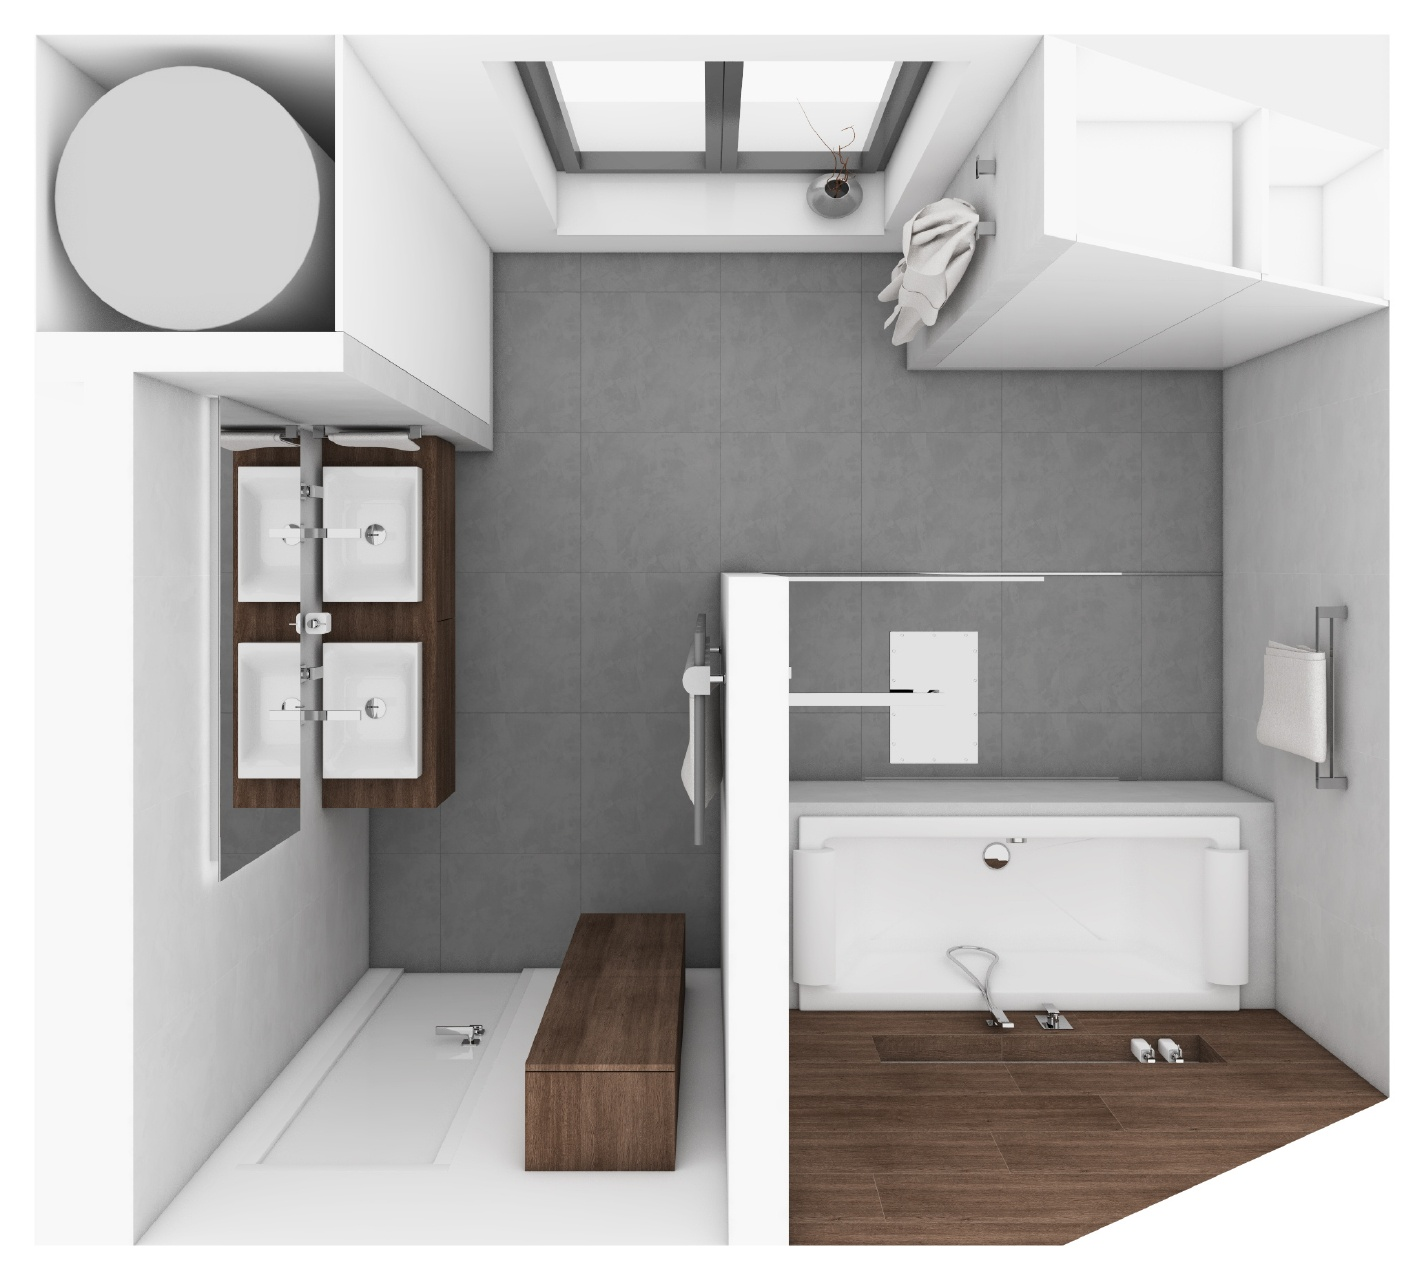 Modernes badezimmer breeze perfecto design - Moderne badezimmer grundrisse ...